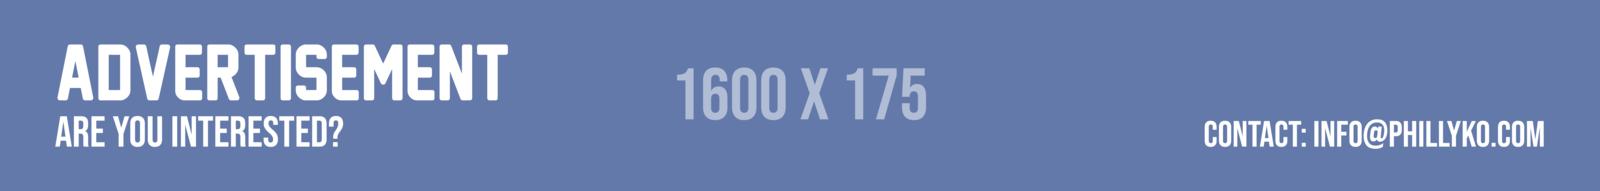 Advertisement banner 1600 X 175.